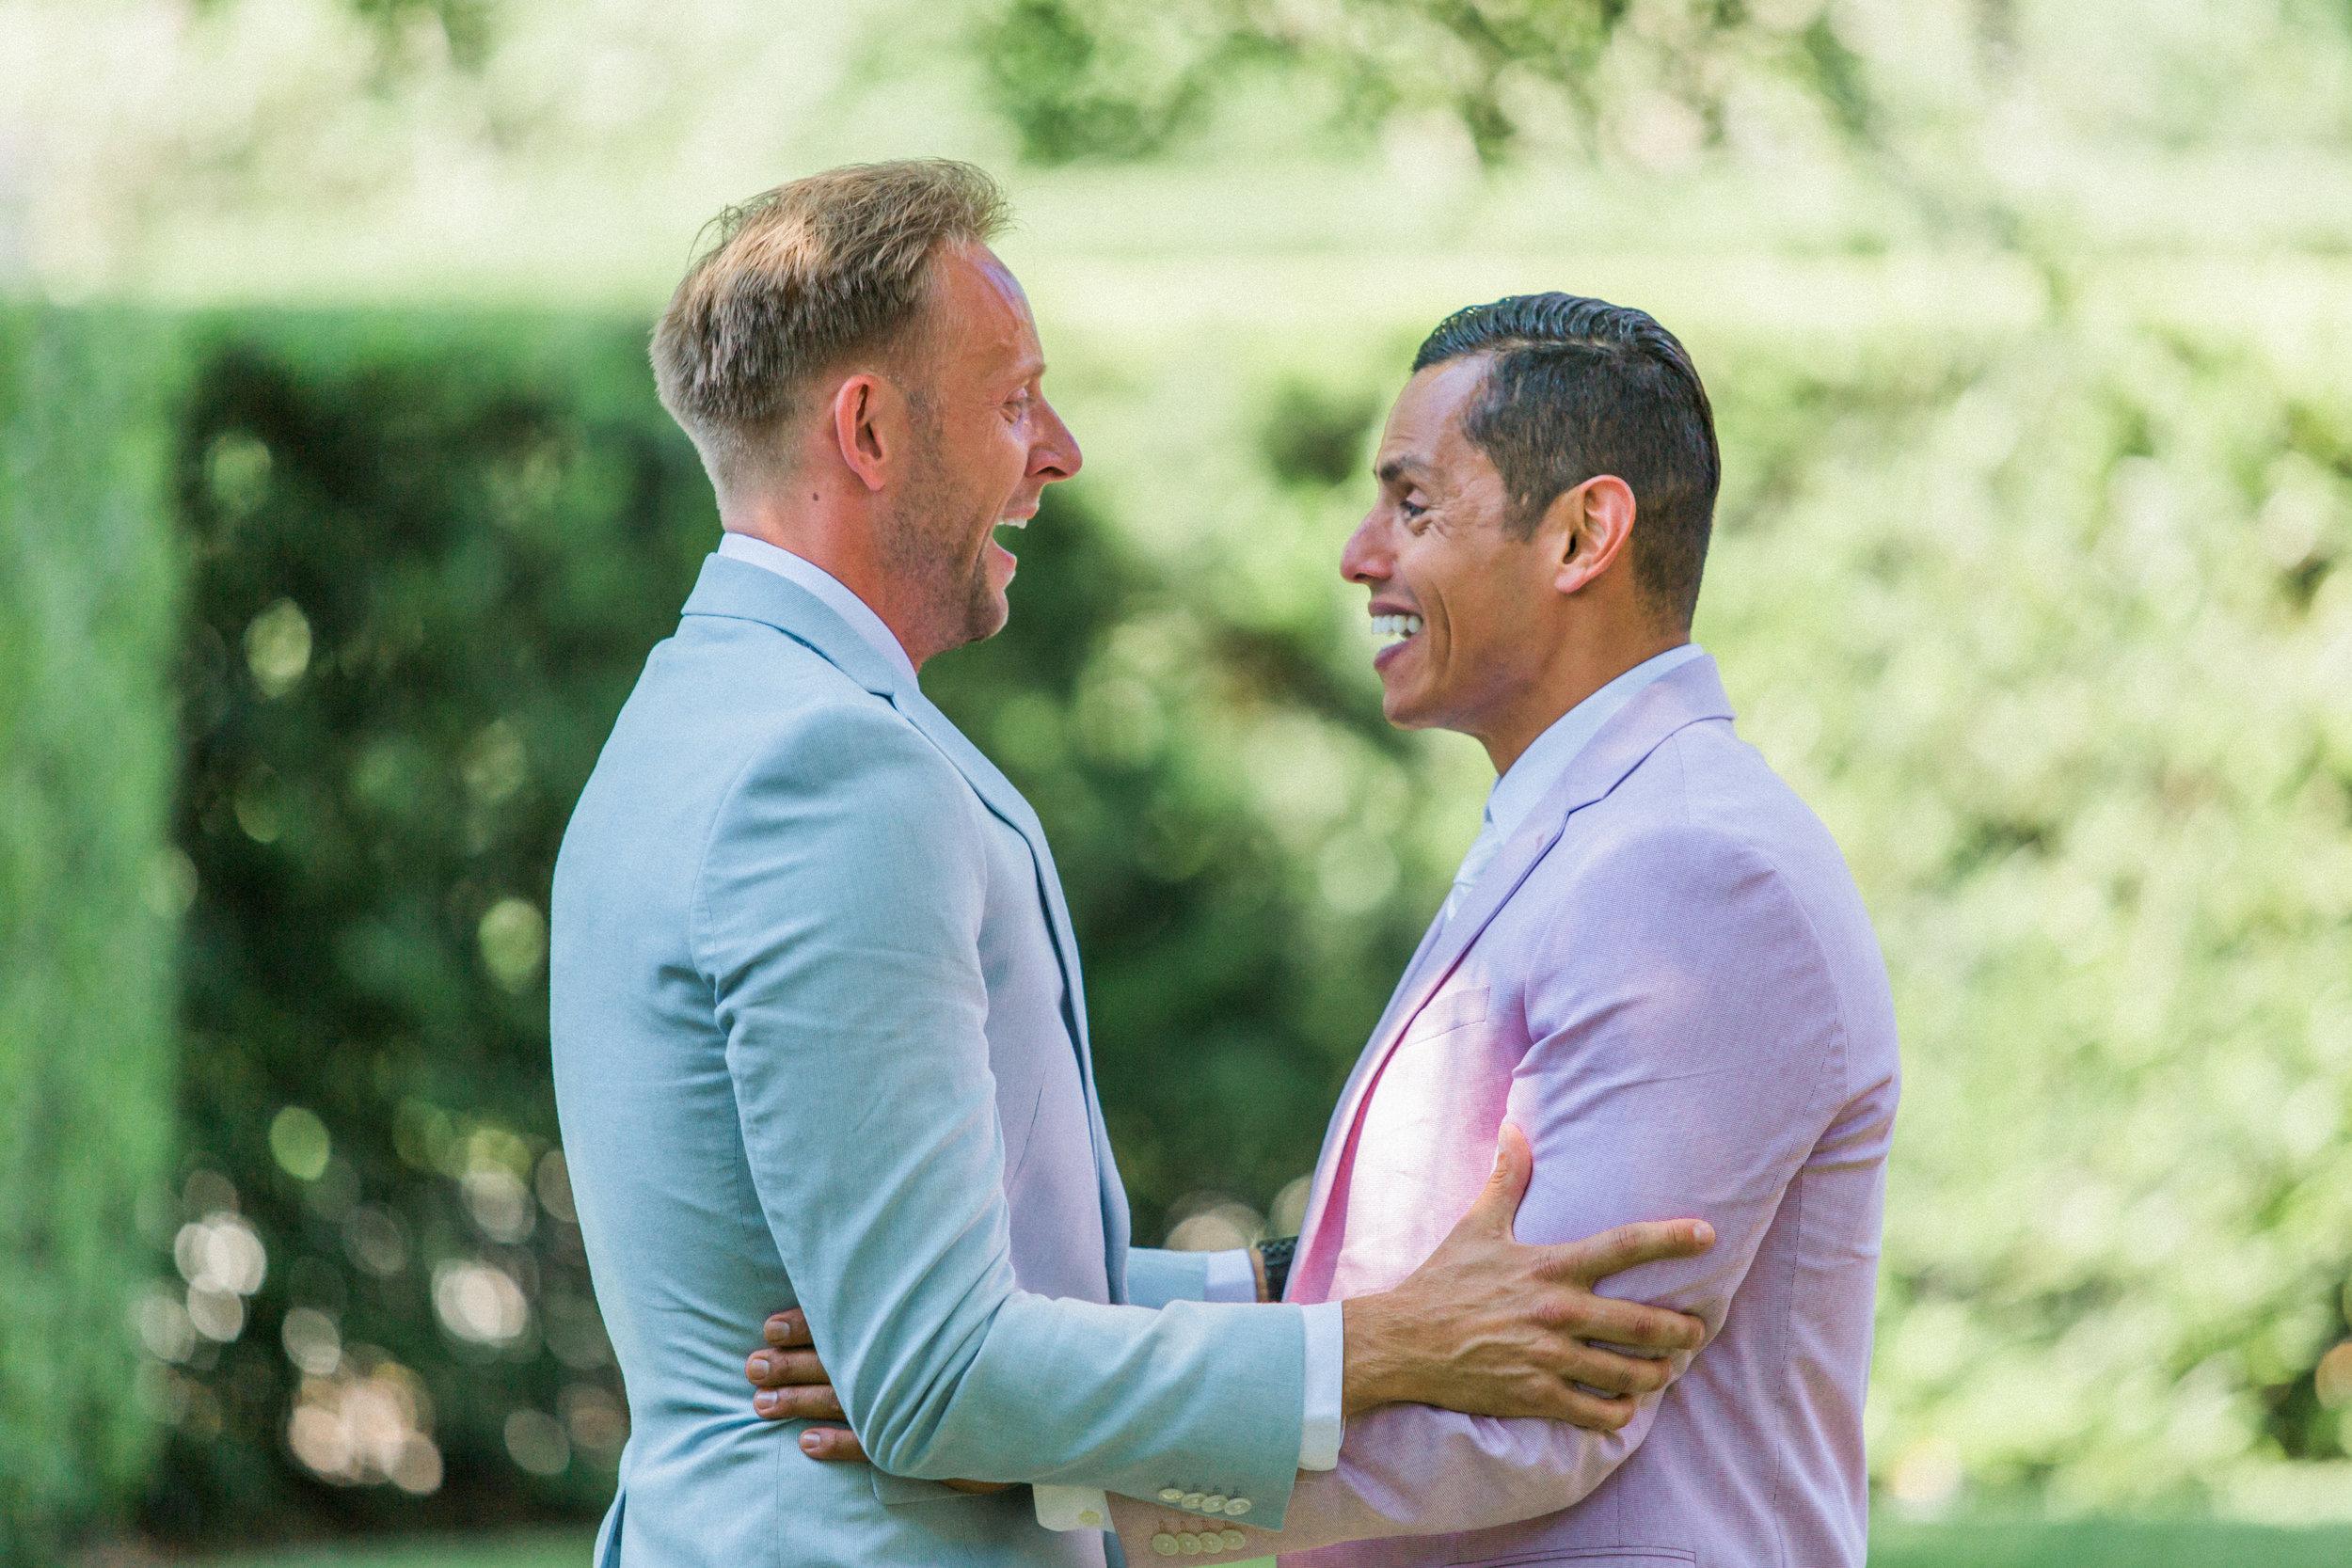 1. First Look Hector+Richard Winter Park Gay Wedding 15.jpg